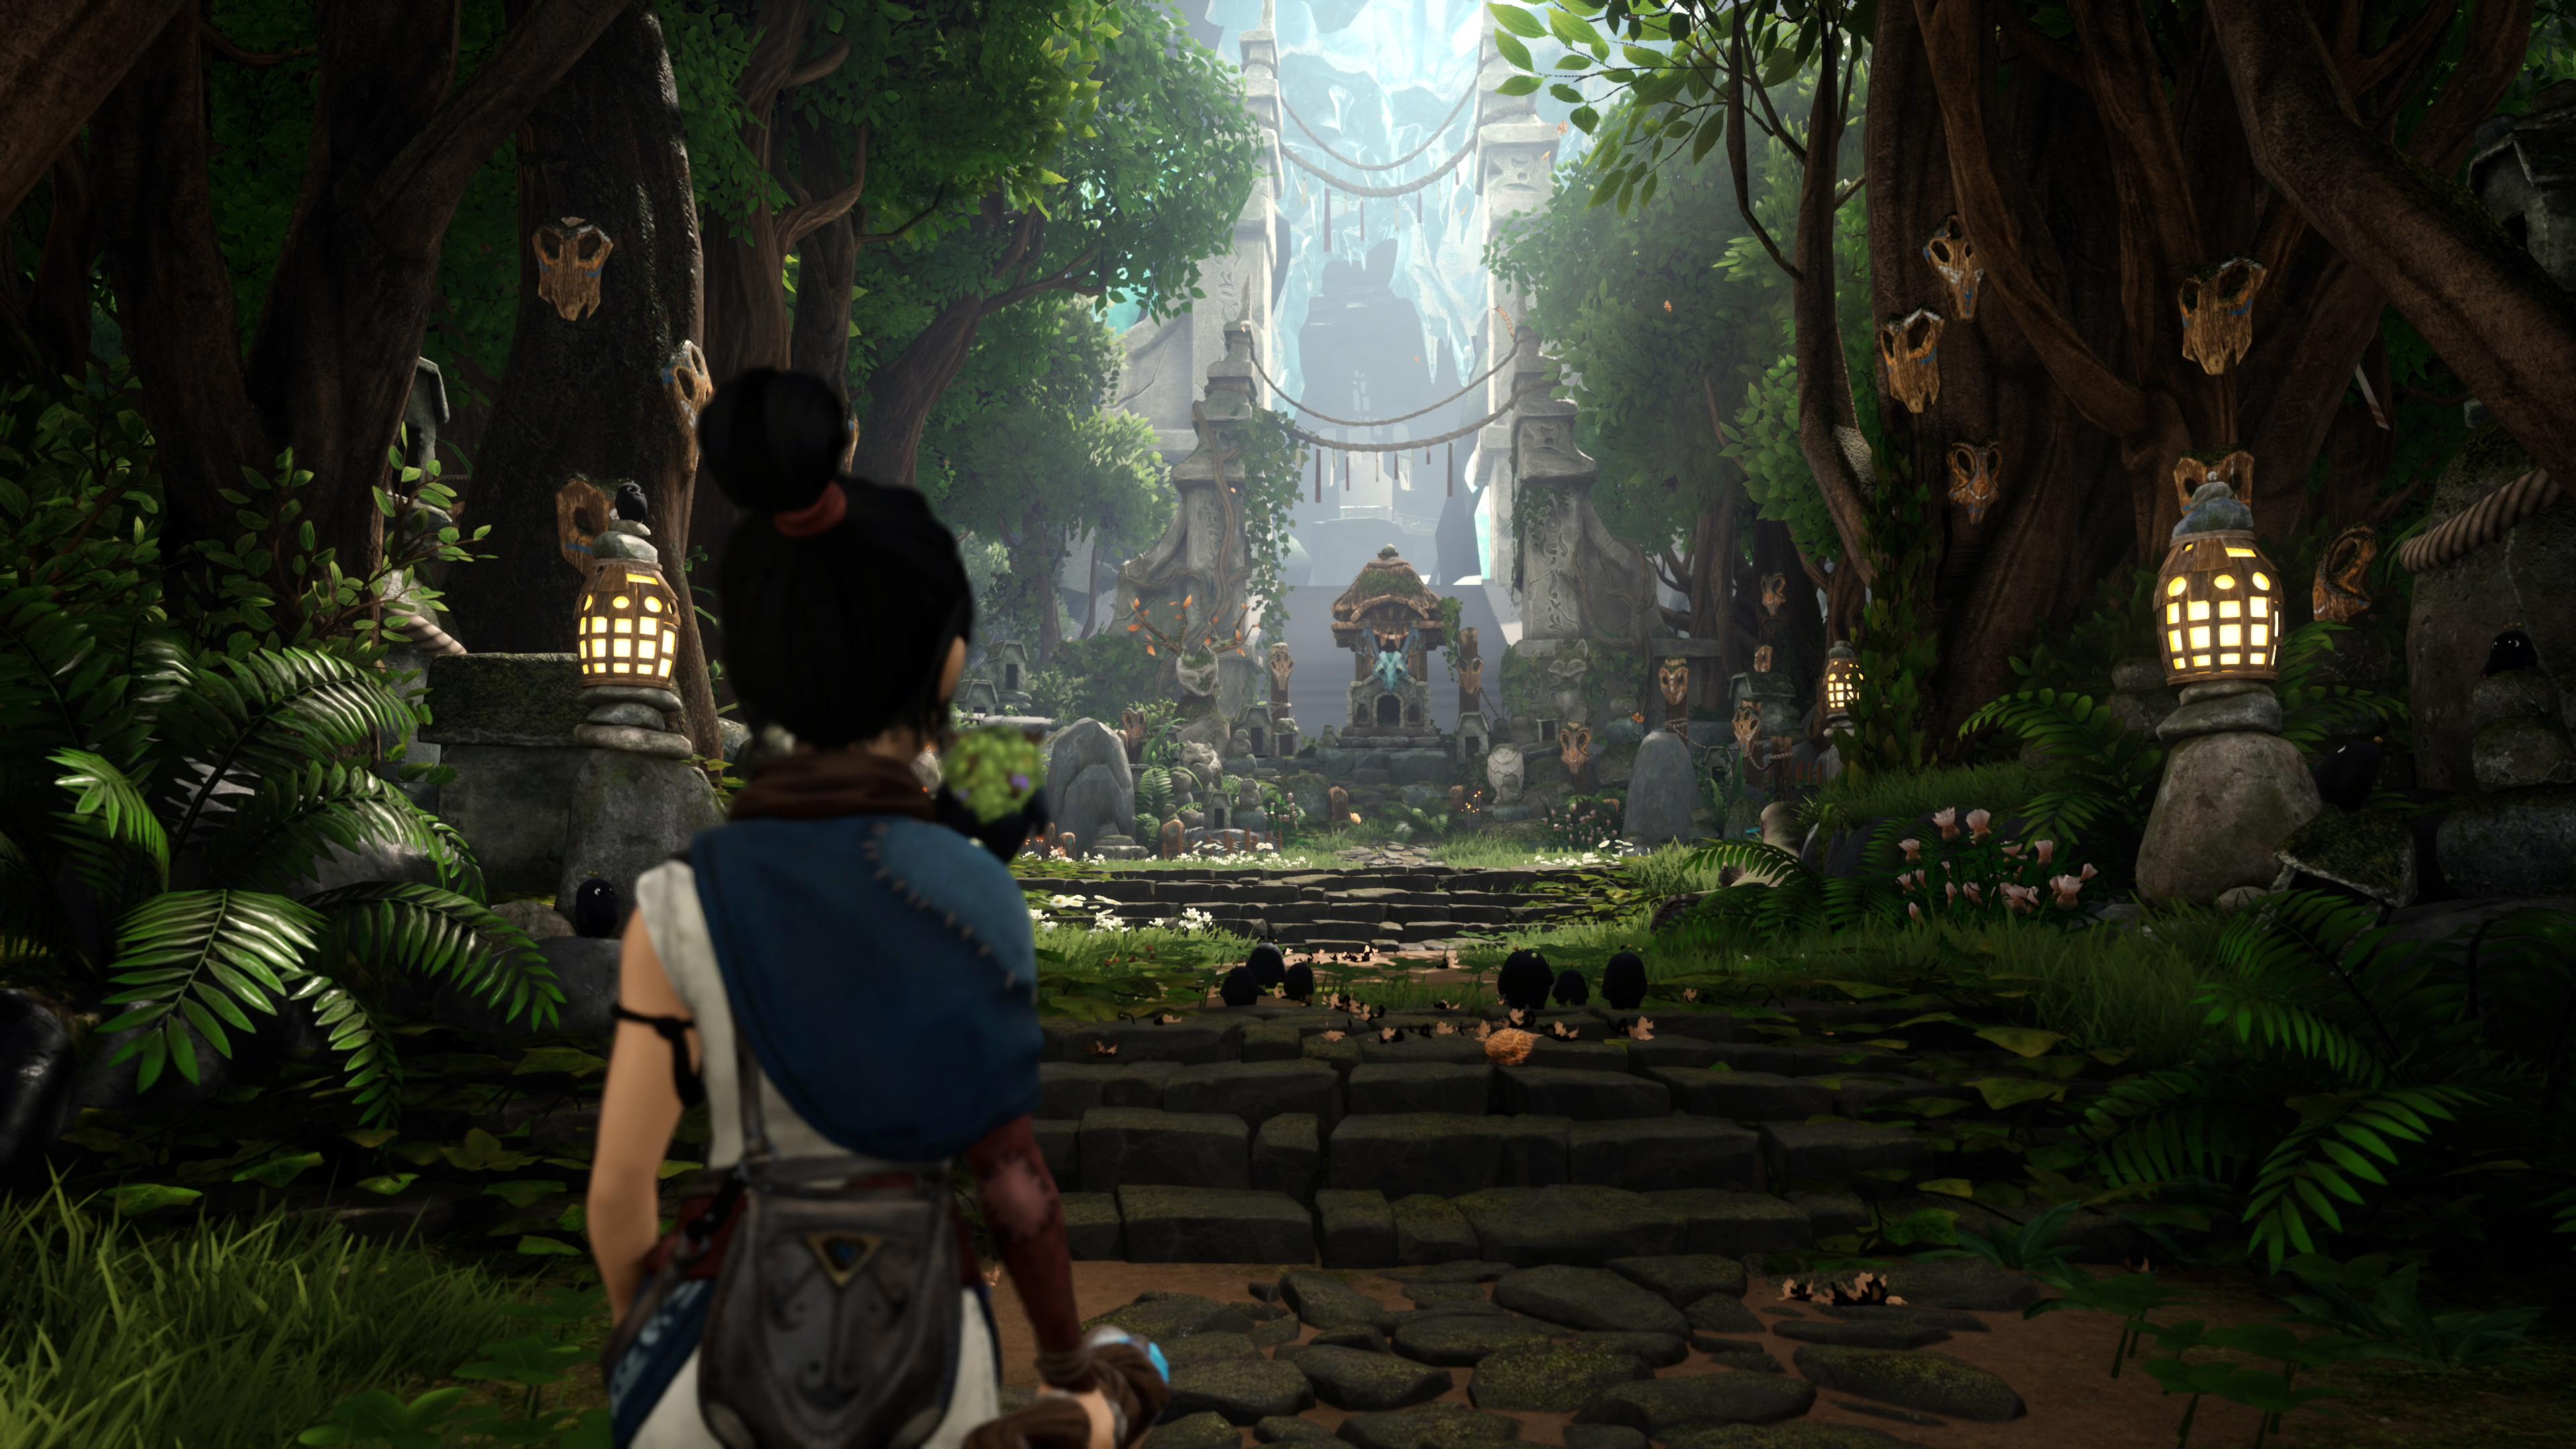 Скриншот №5 к Kena Bridge of Spirits Digital Deluxe PS4 and PS5